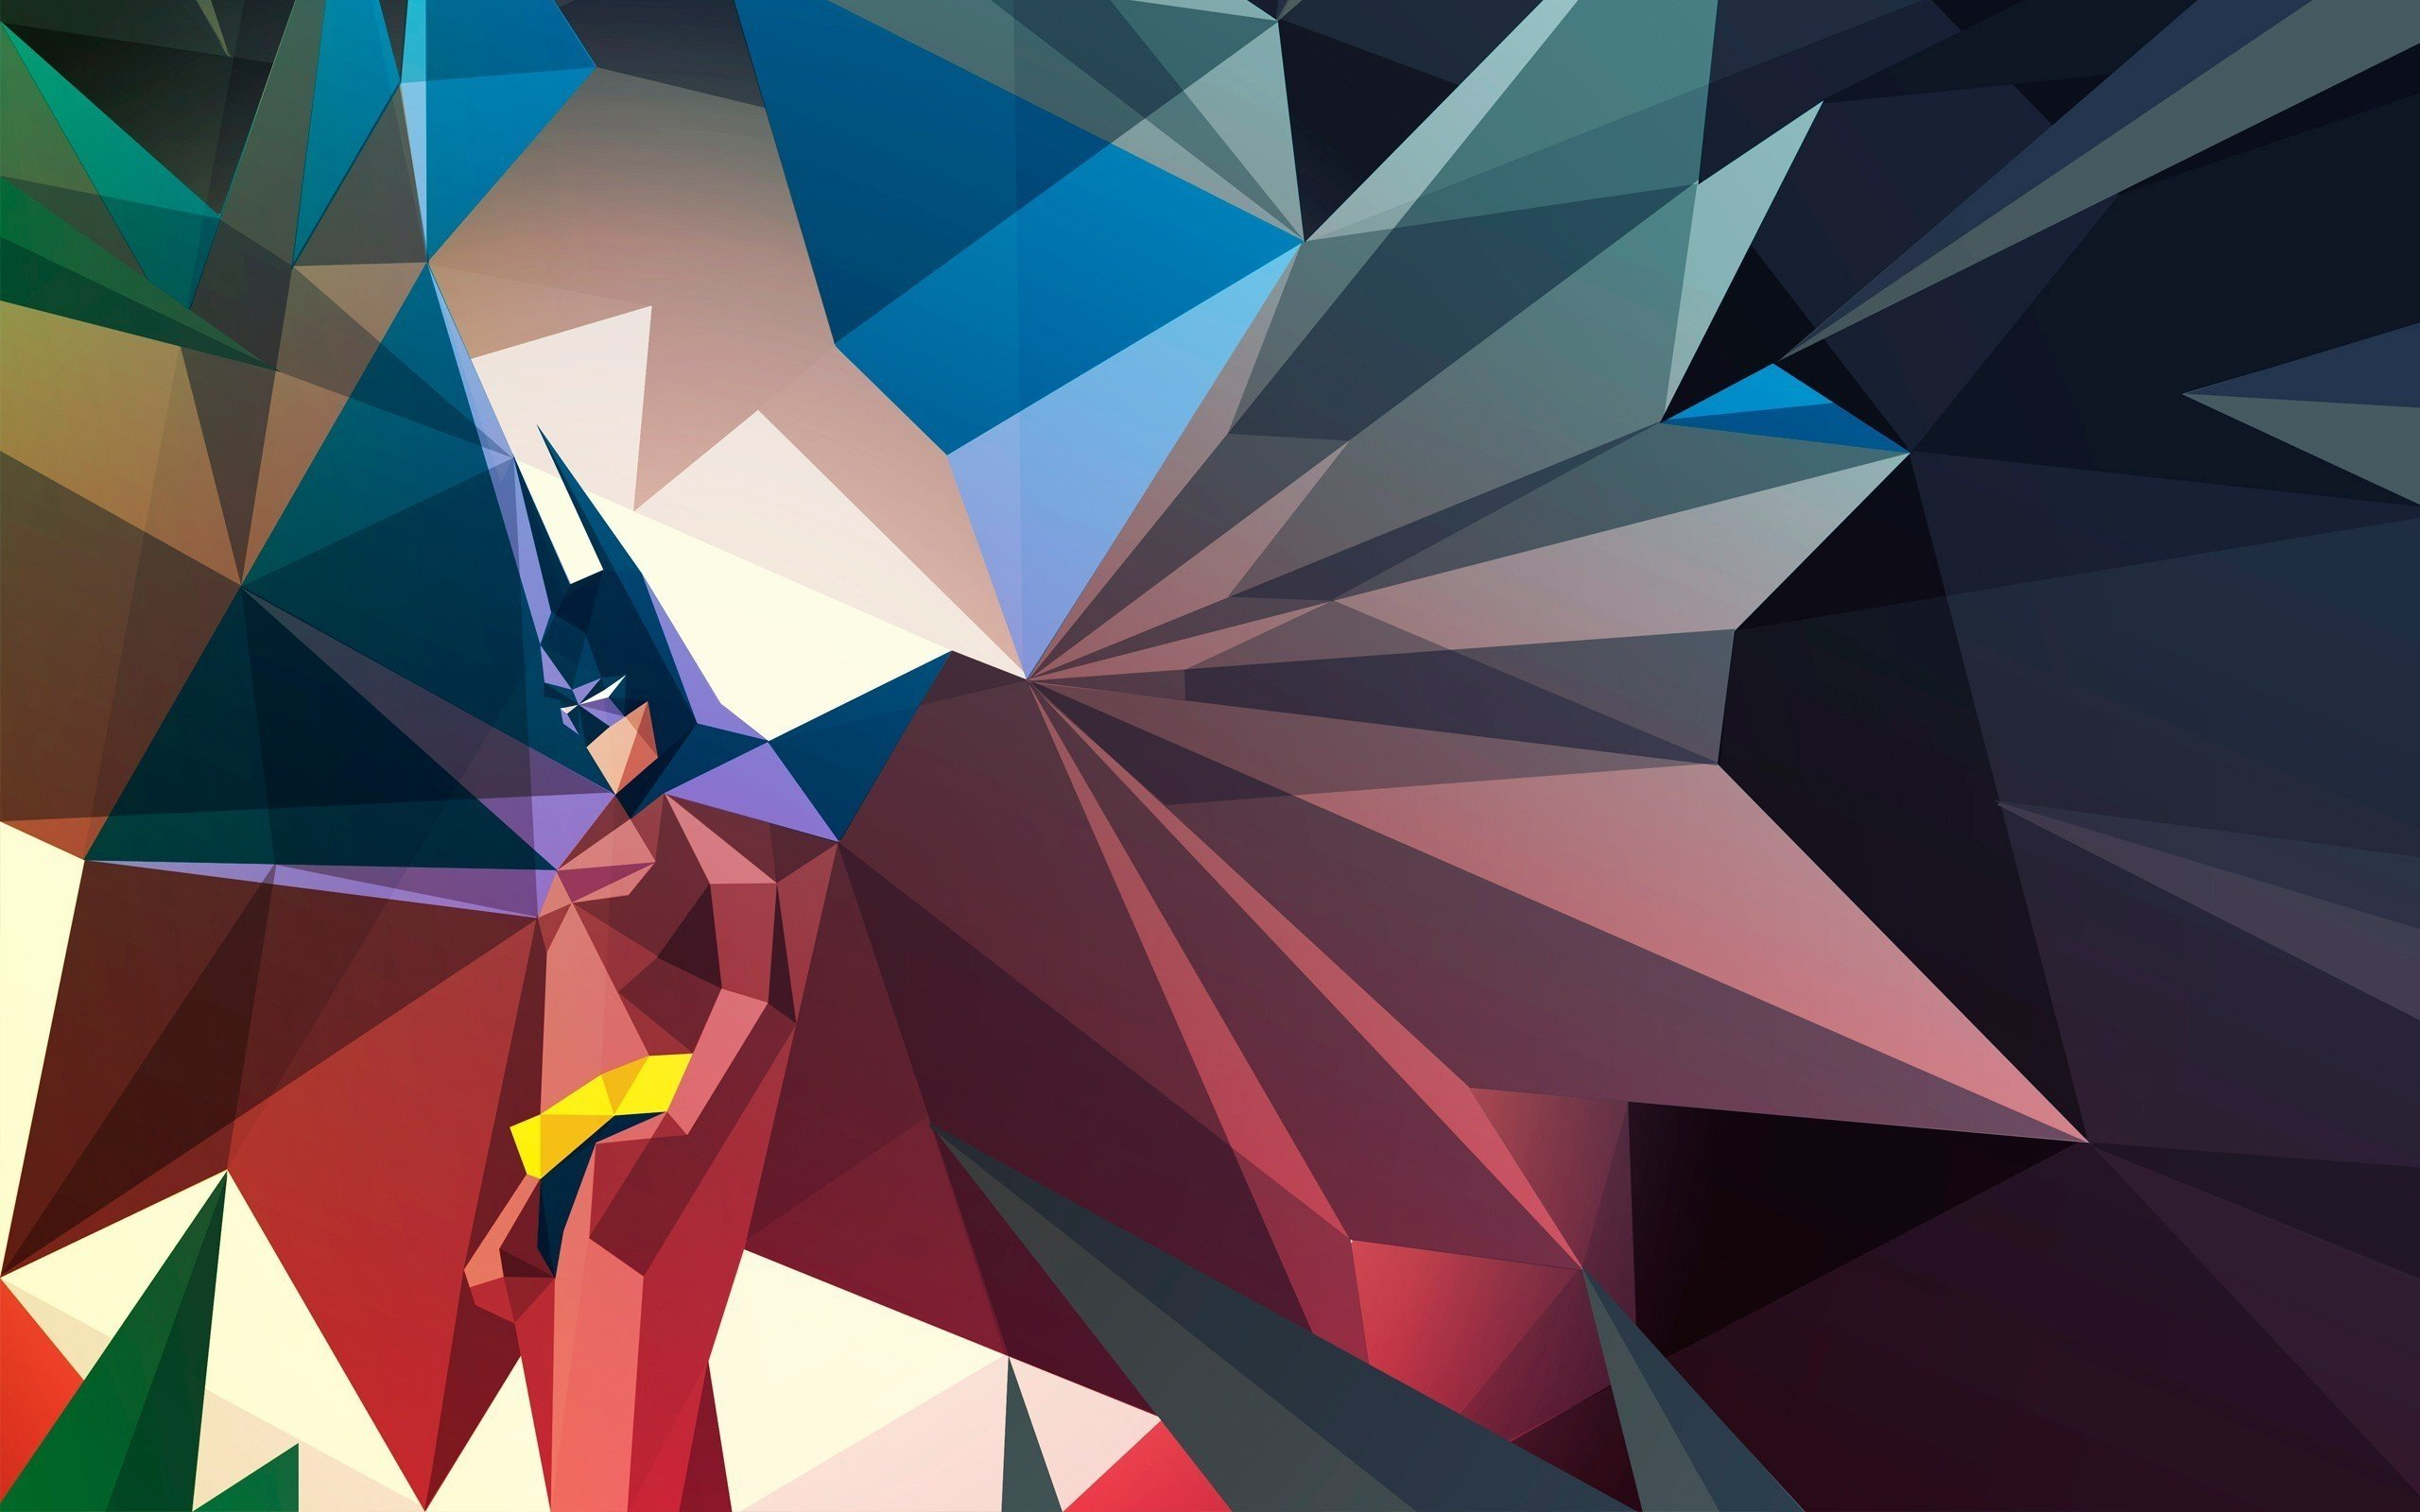 47+ Minimalist Superhero Wallpaper on WallpaperSafari